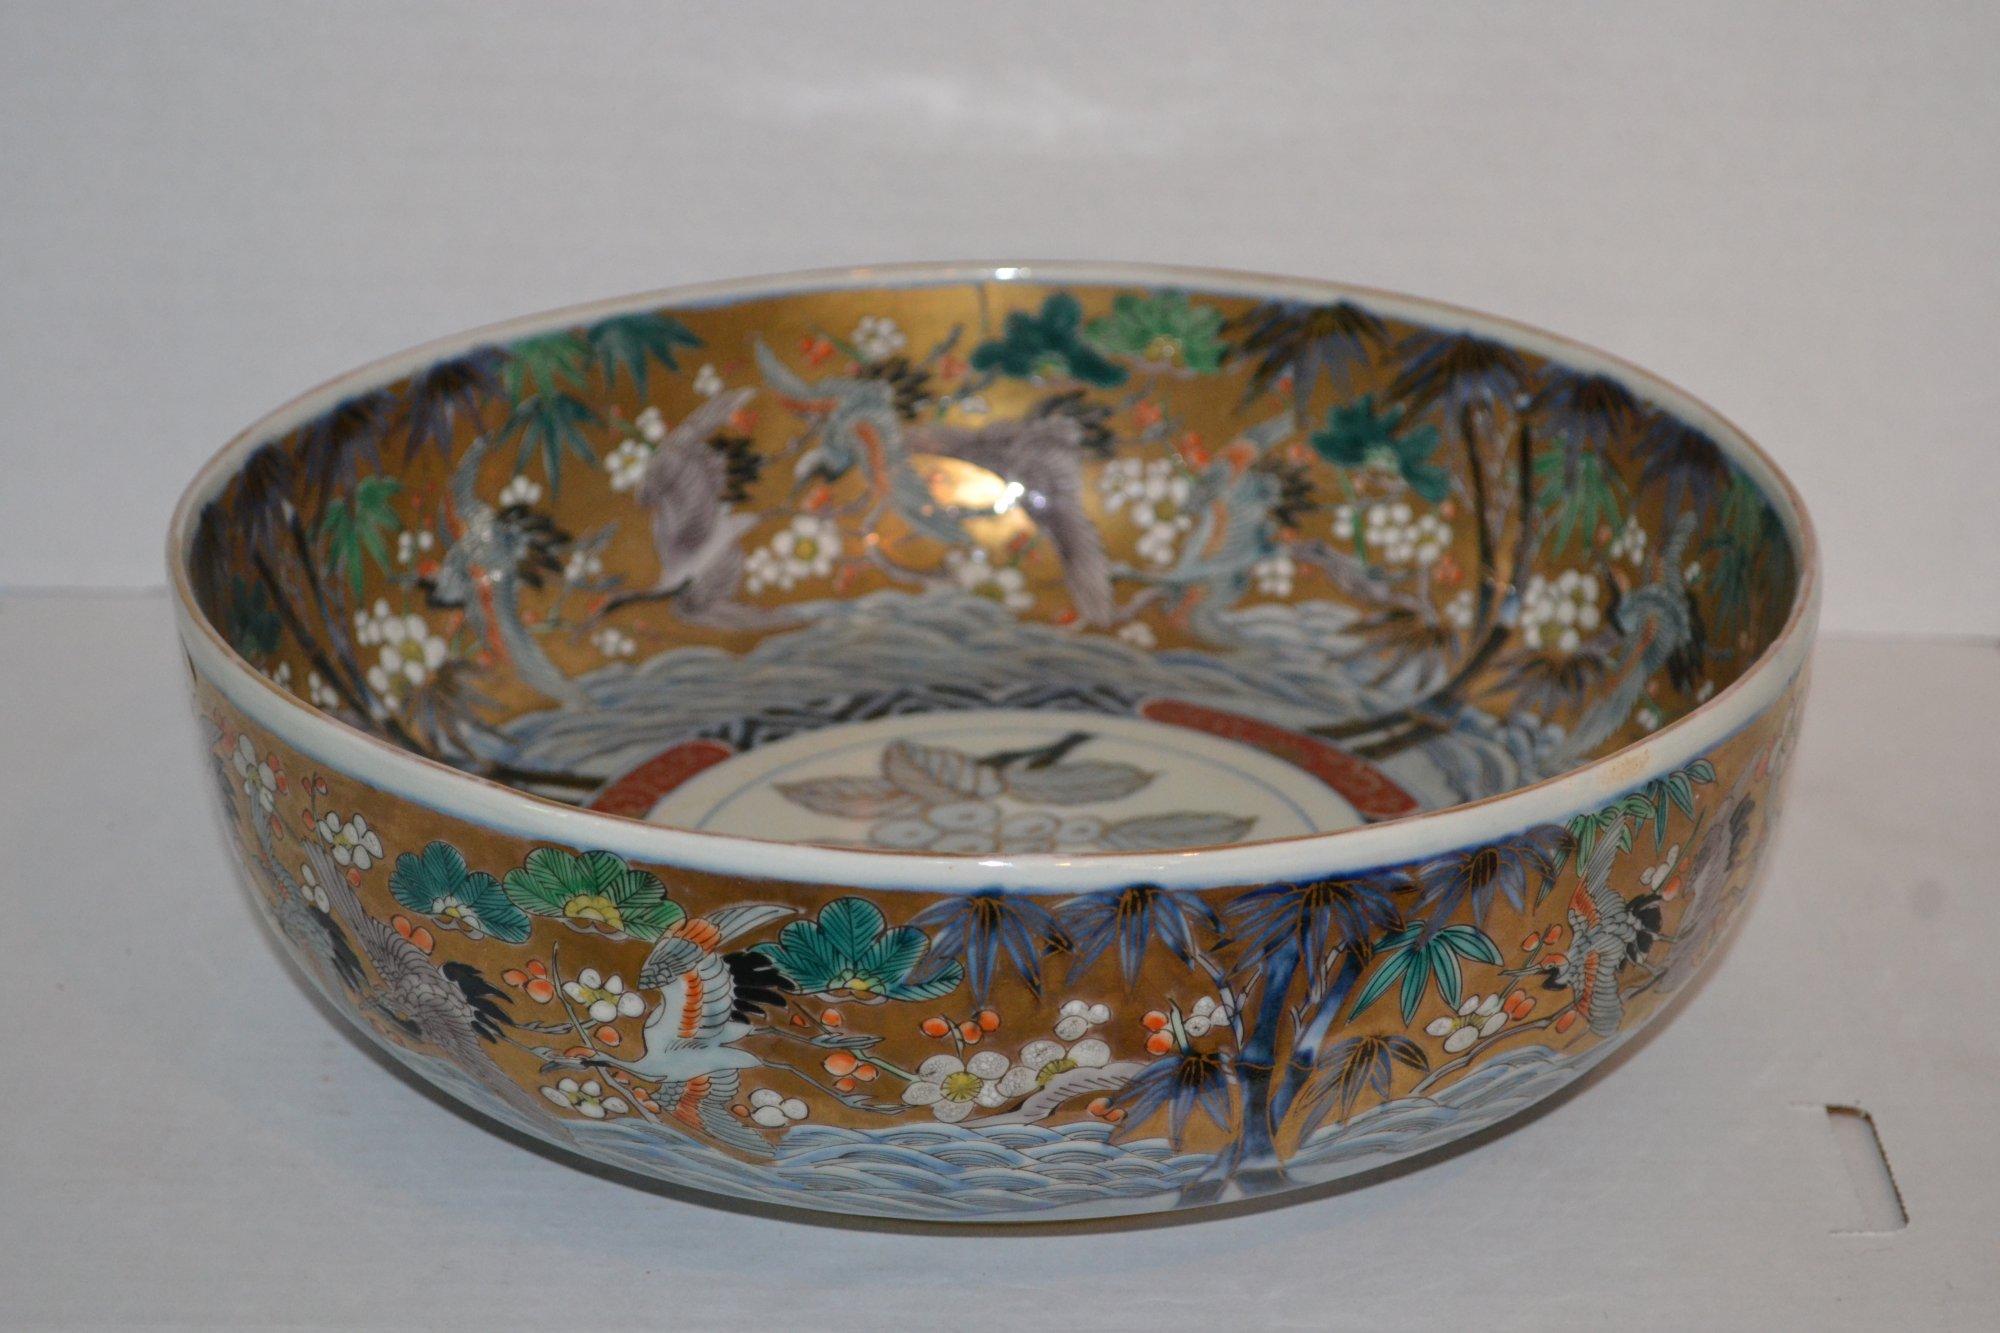 19th Century Japanese Imari Bowl H. 4 X W. 12